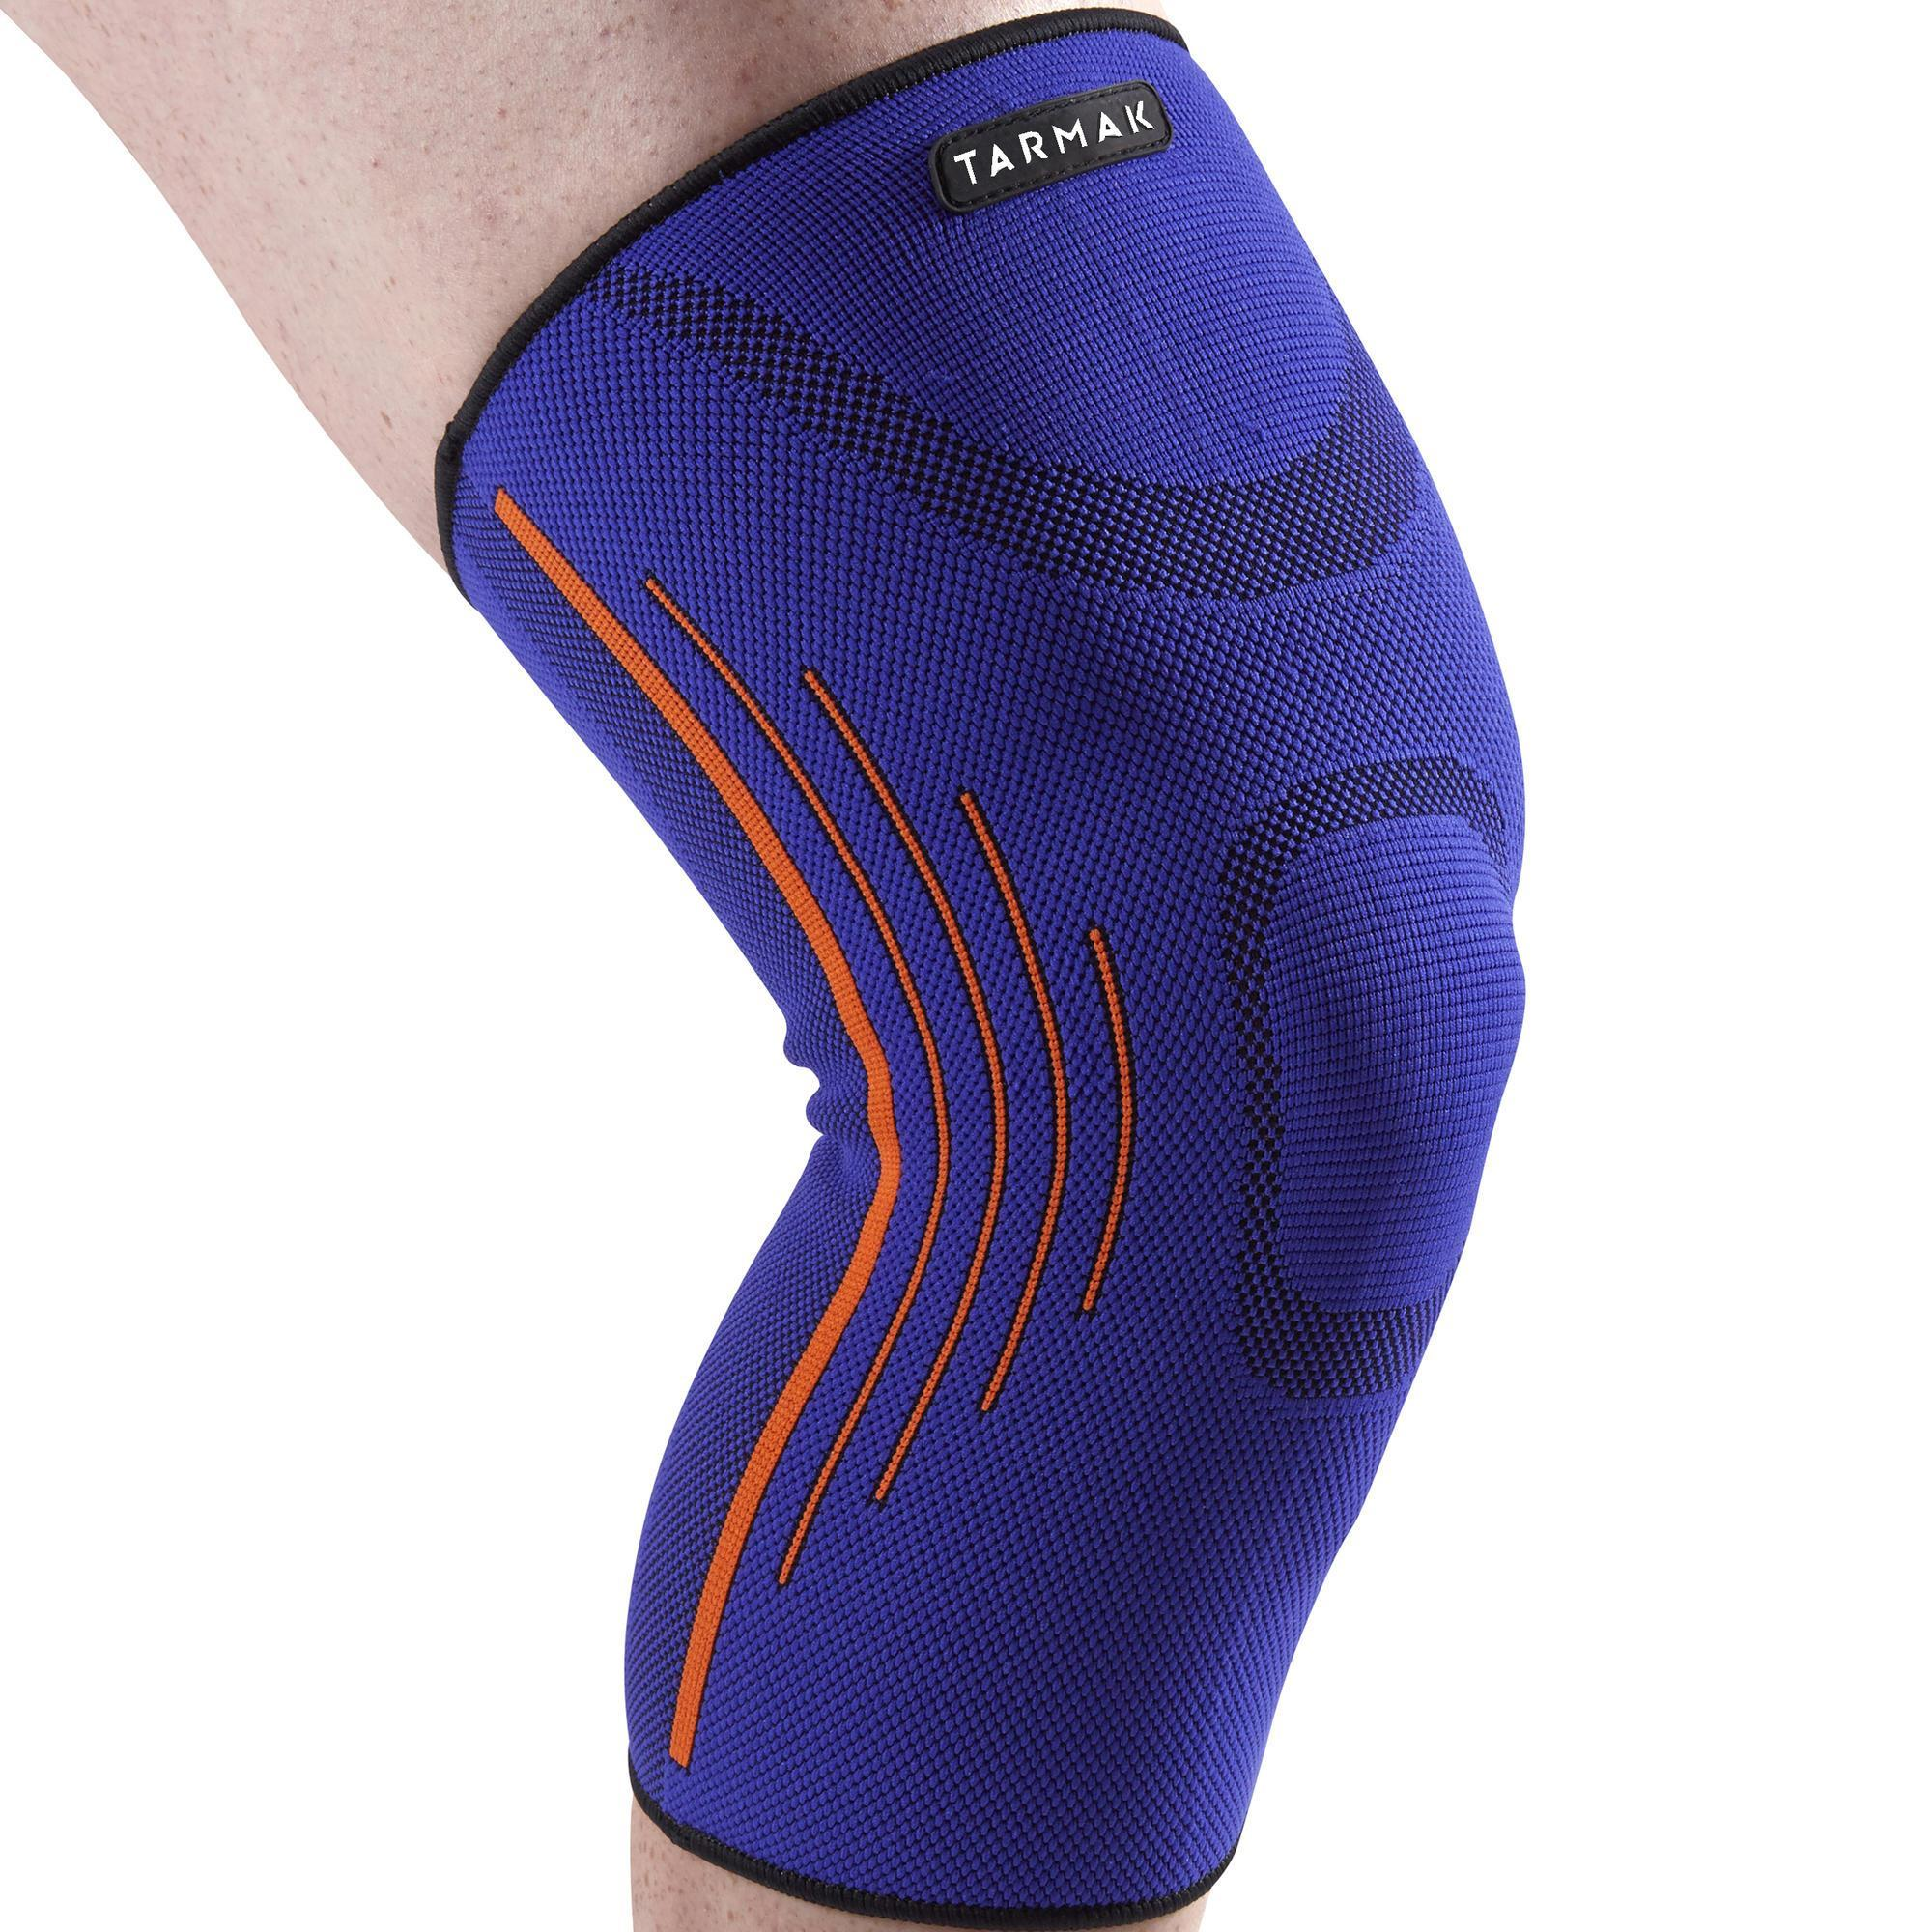 Kniebandage Soft 300 links/rechts Kompression Erwachsene blau